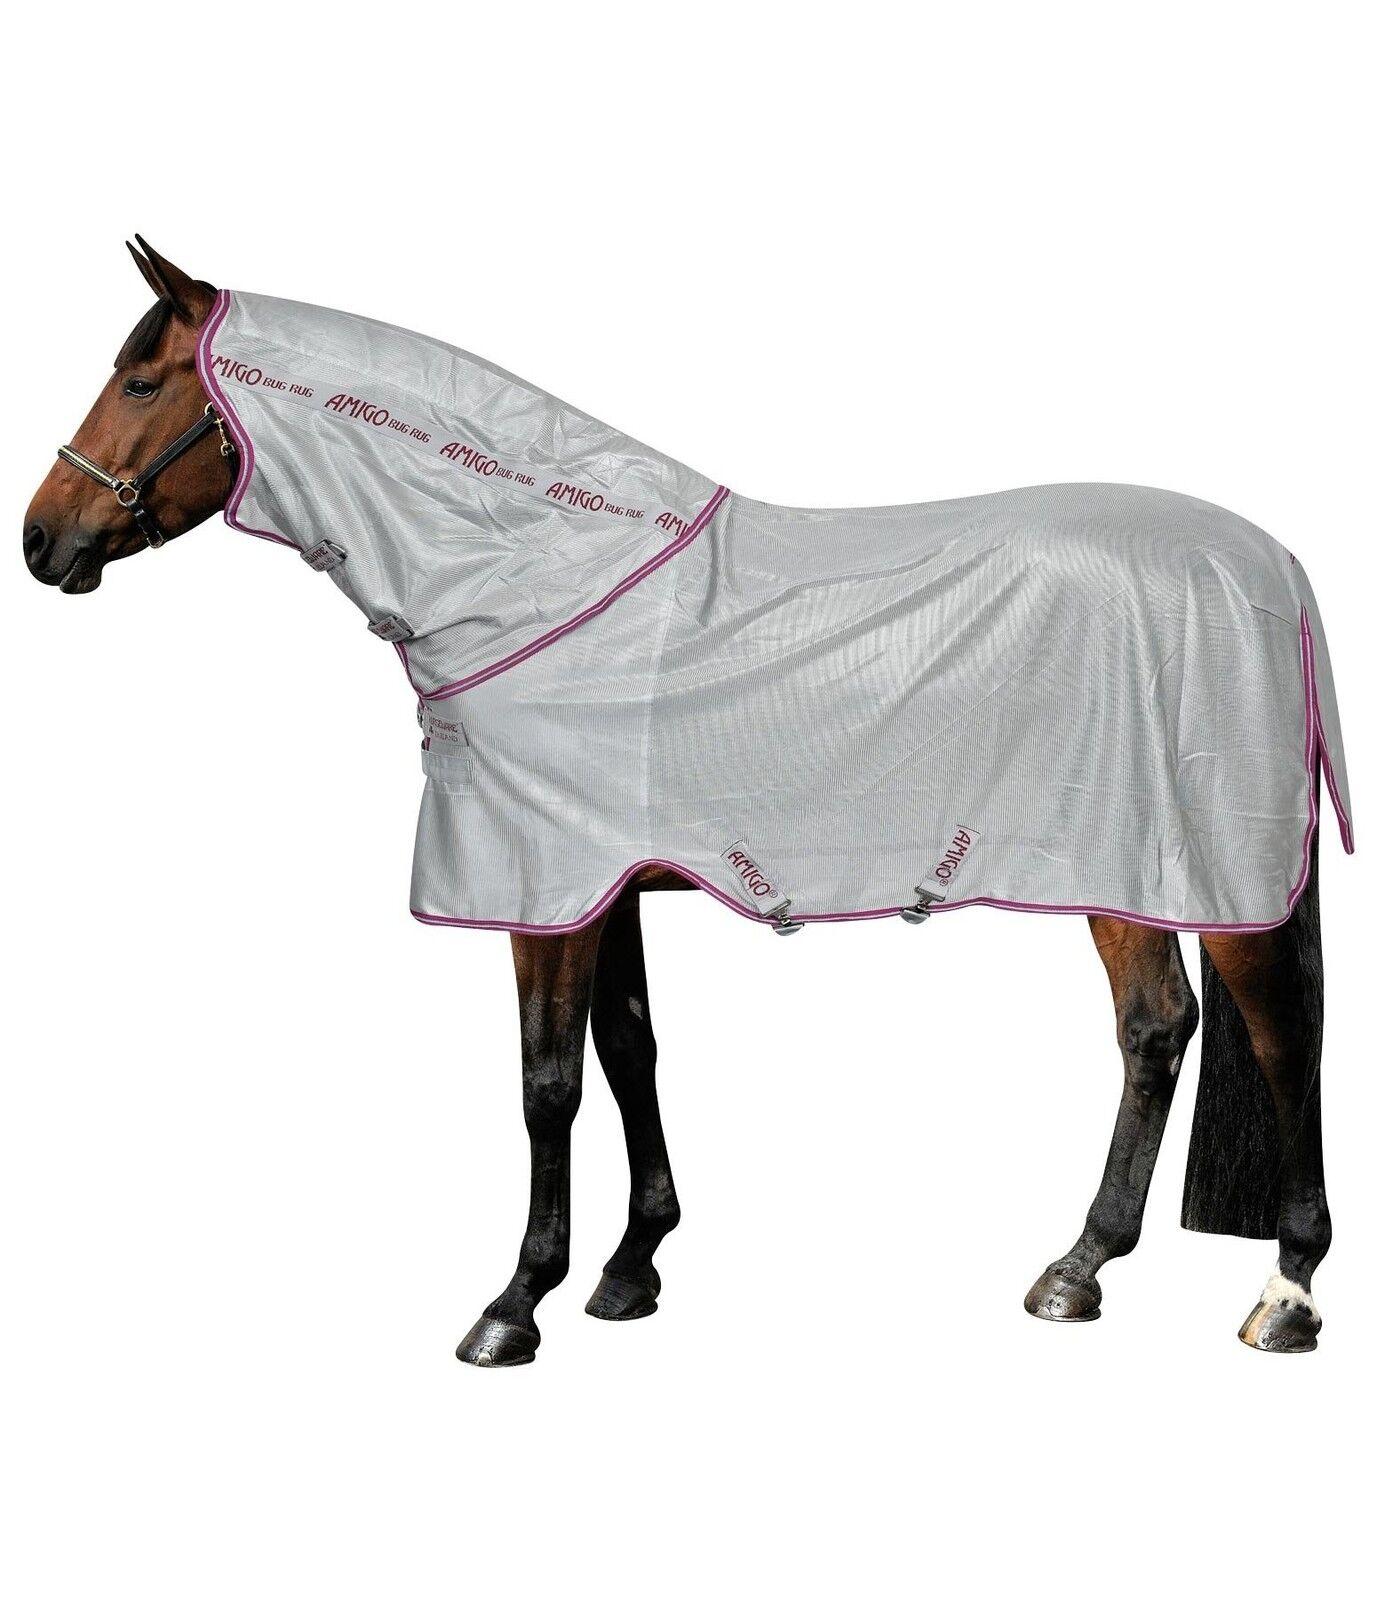 Horseware Amigo Bug Rug Coperta Mosche cavalli coperta coperta pascolo